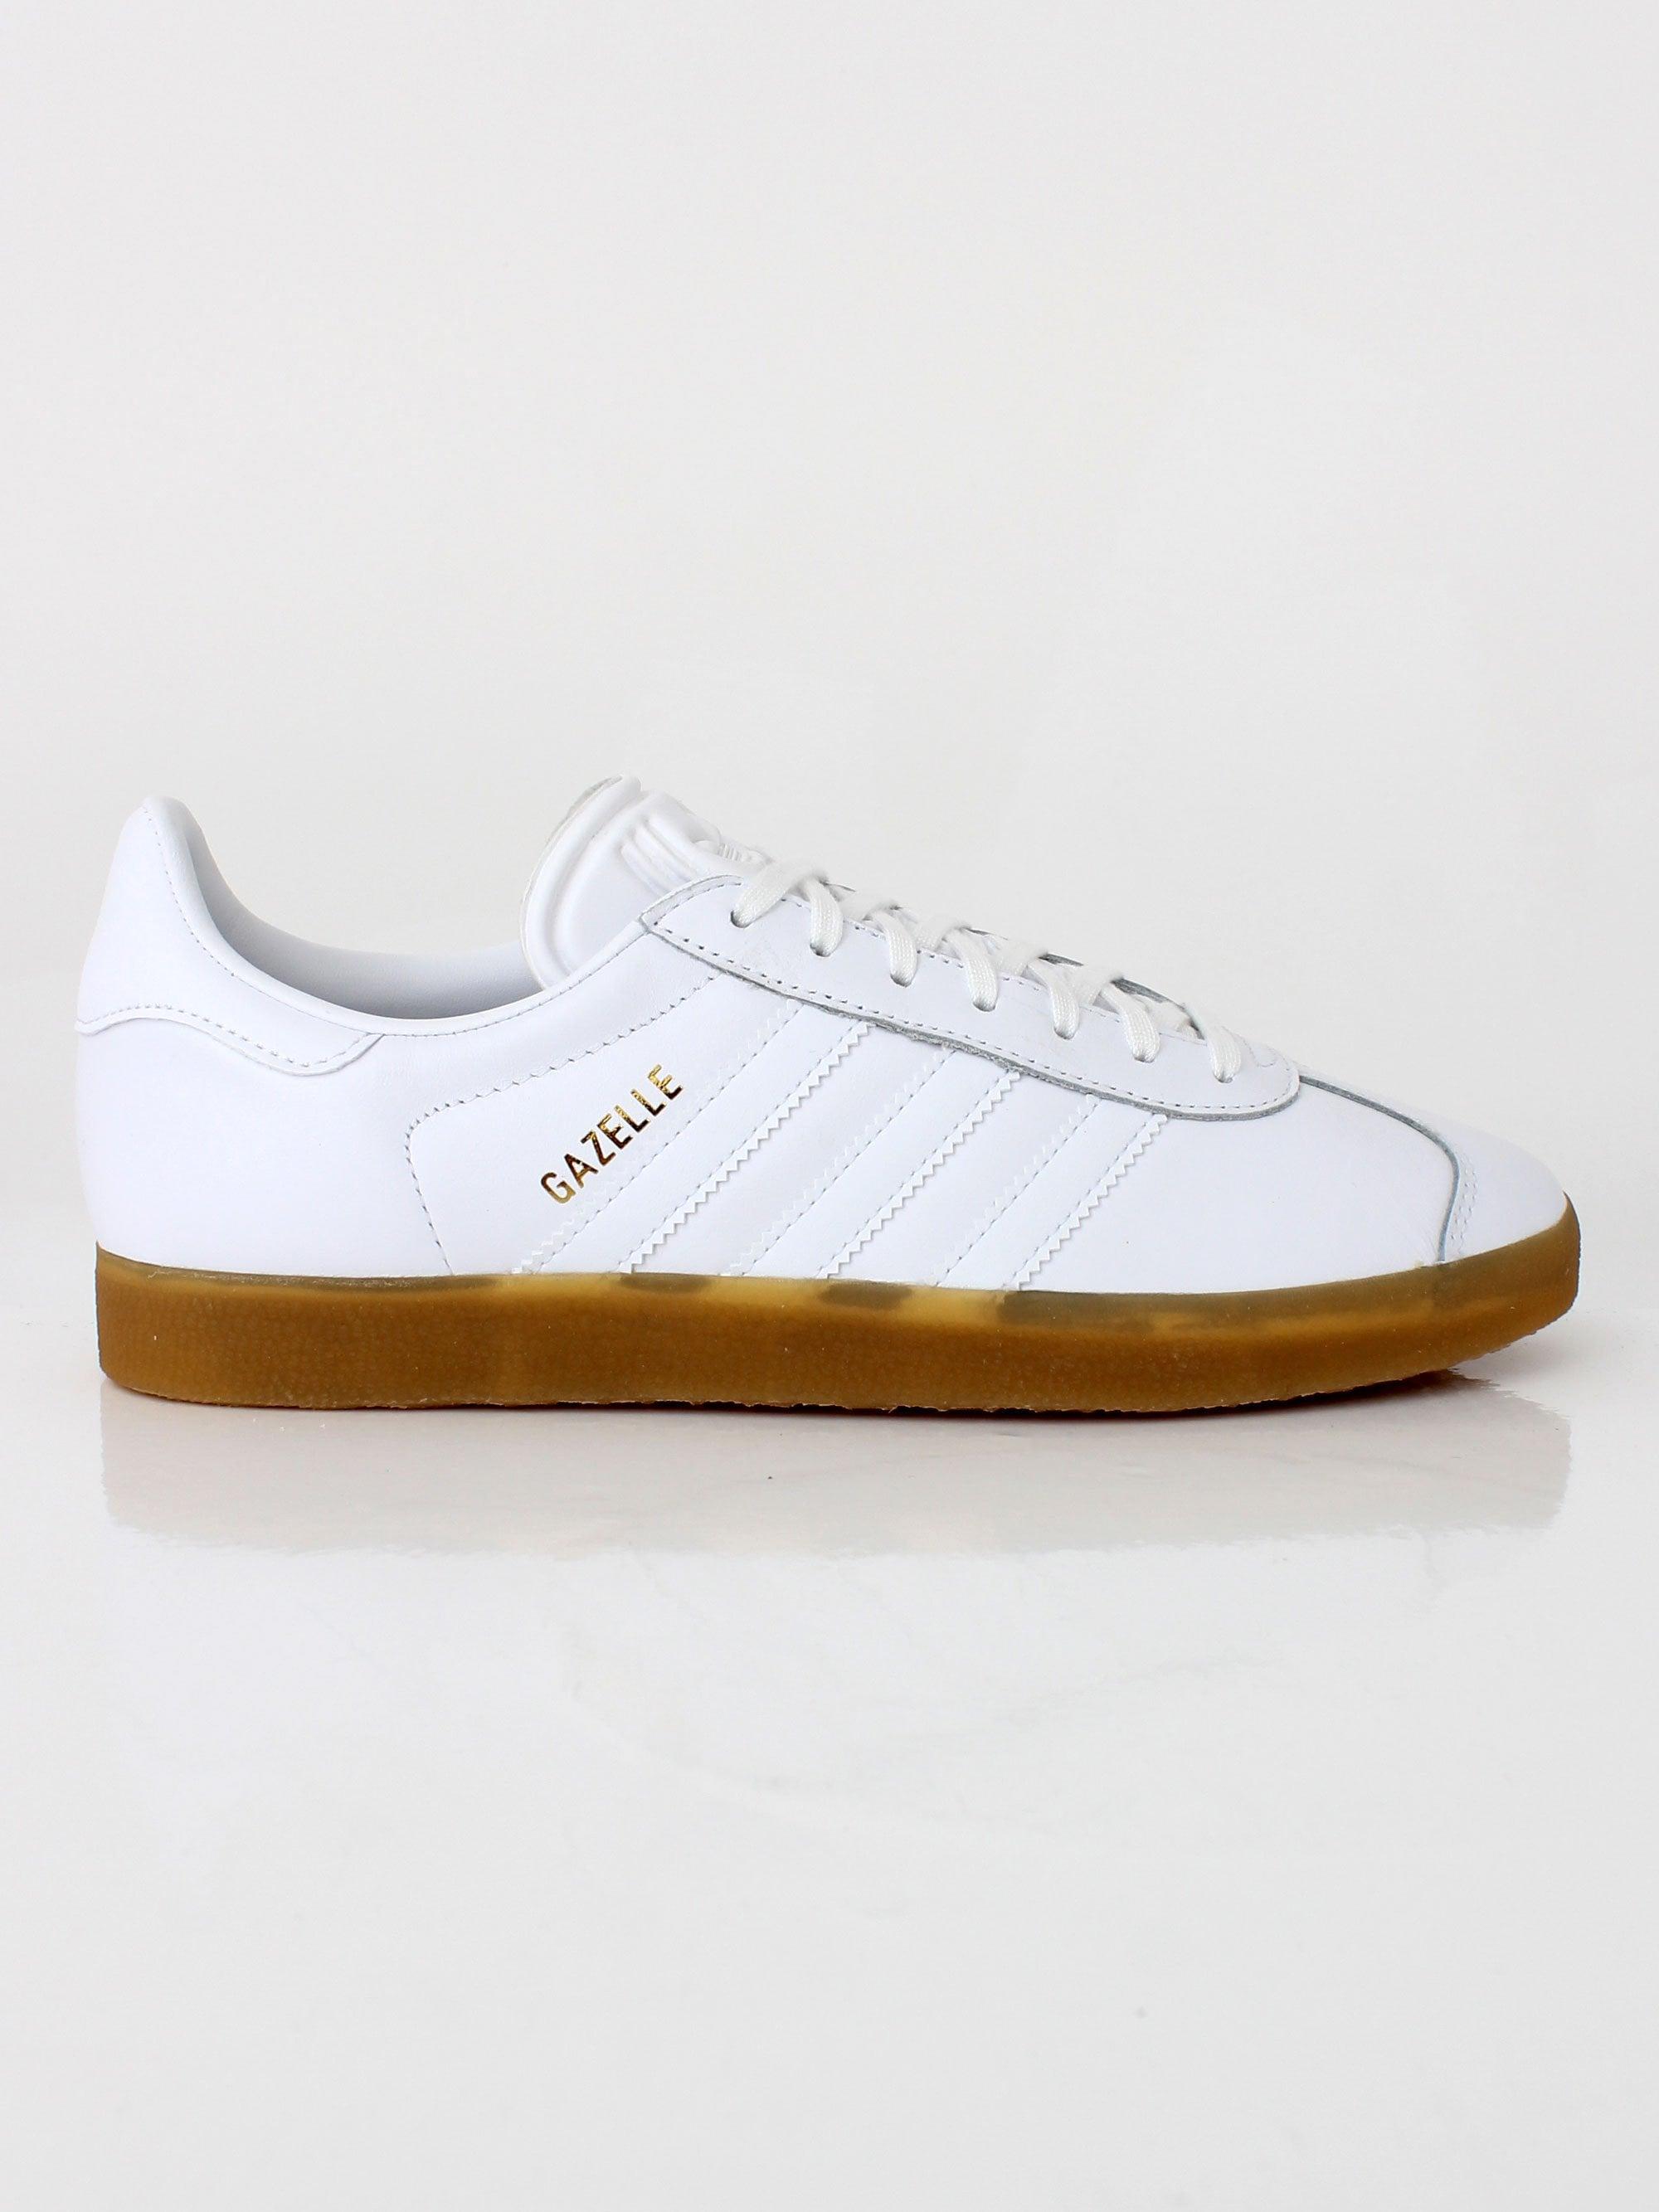 adidas Originals Gazelle - White/Gum